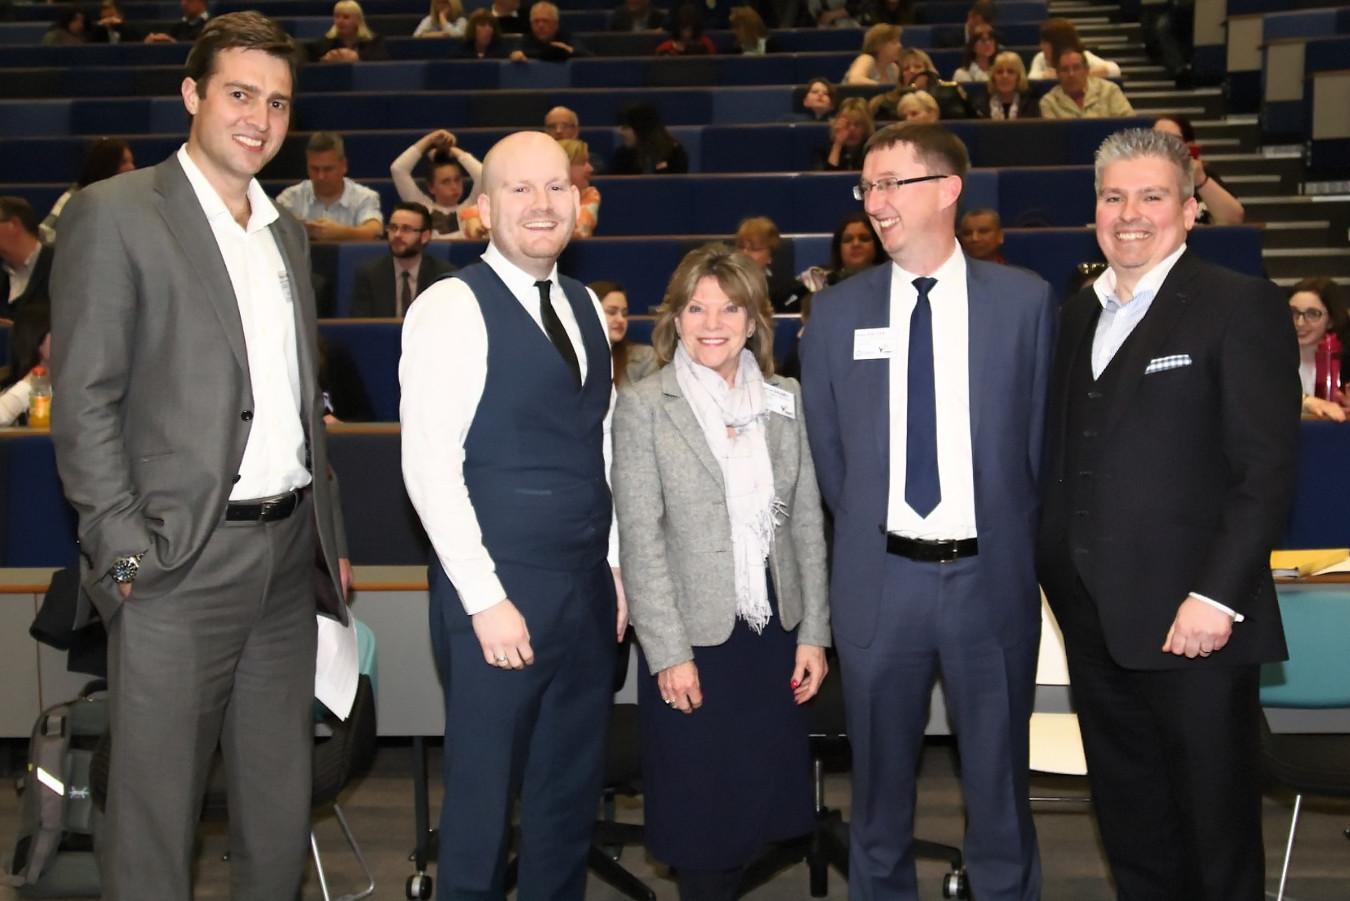 Young Enterprise Regional finals in Essex